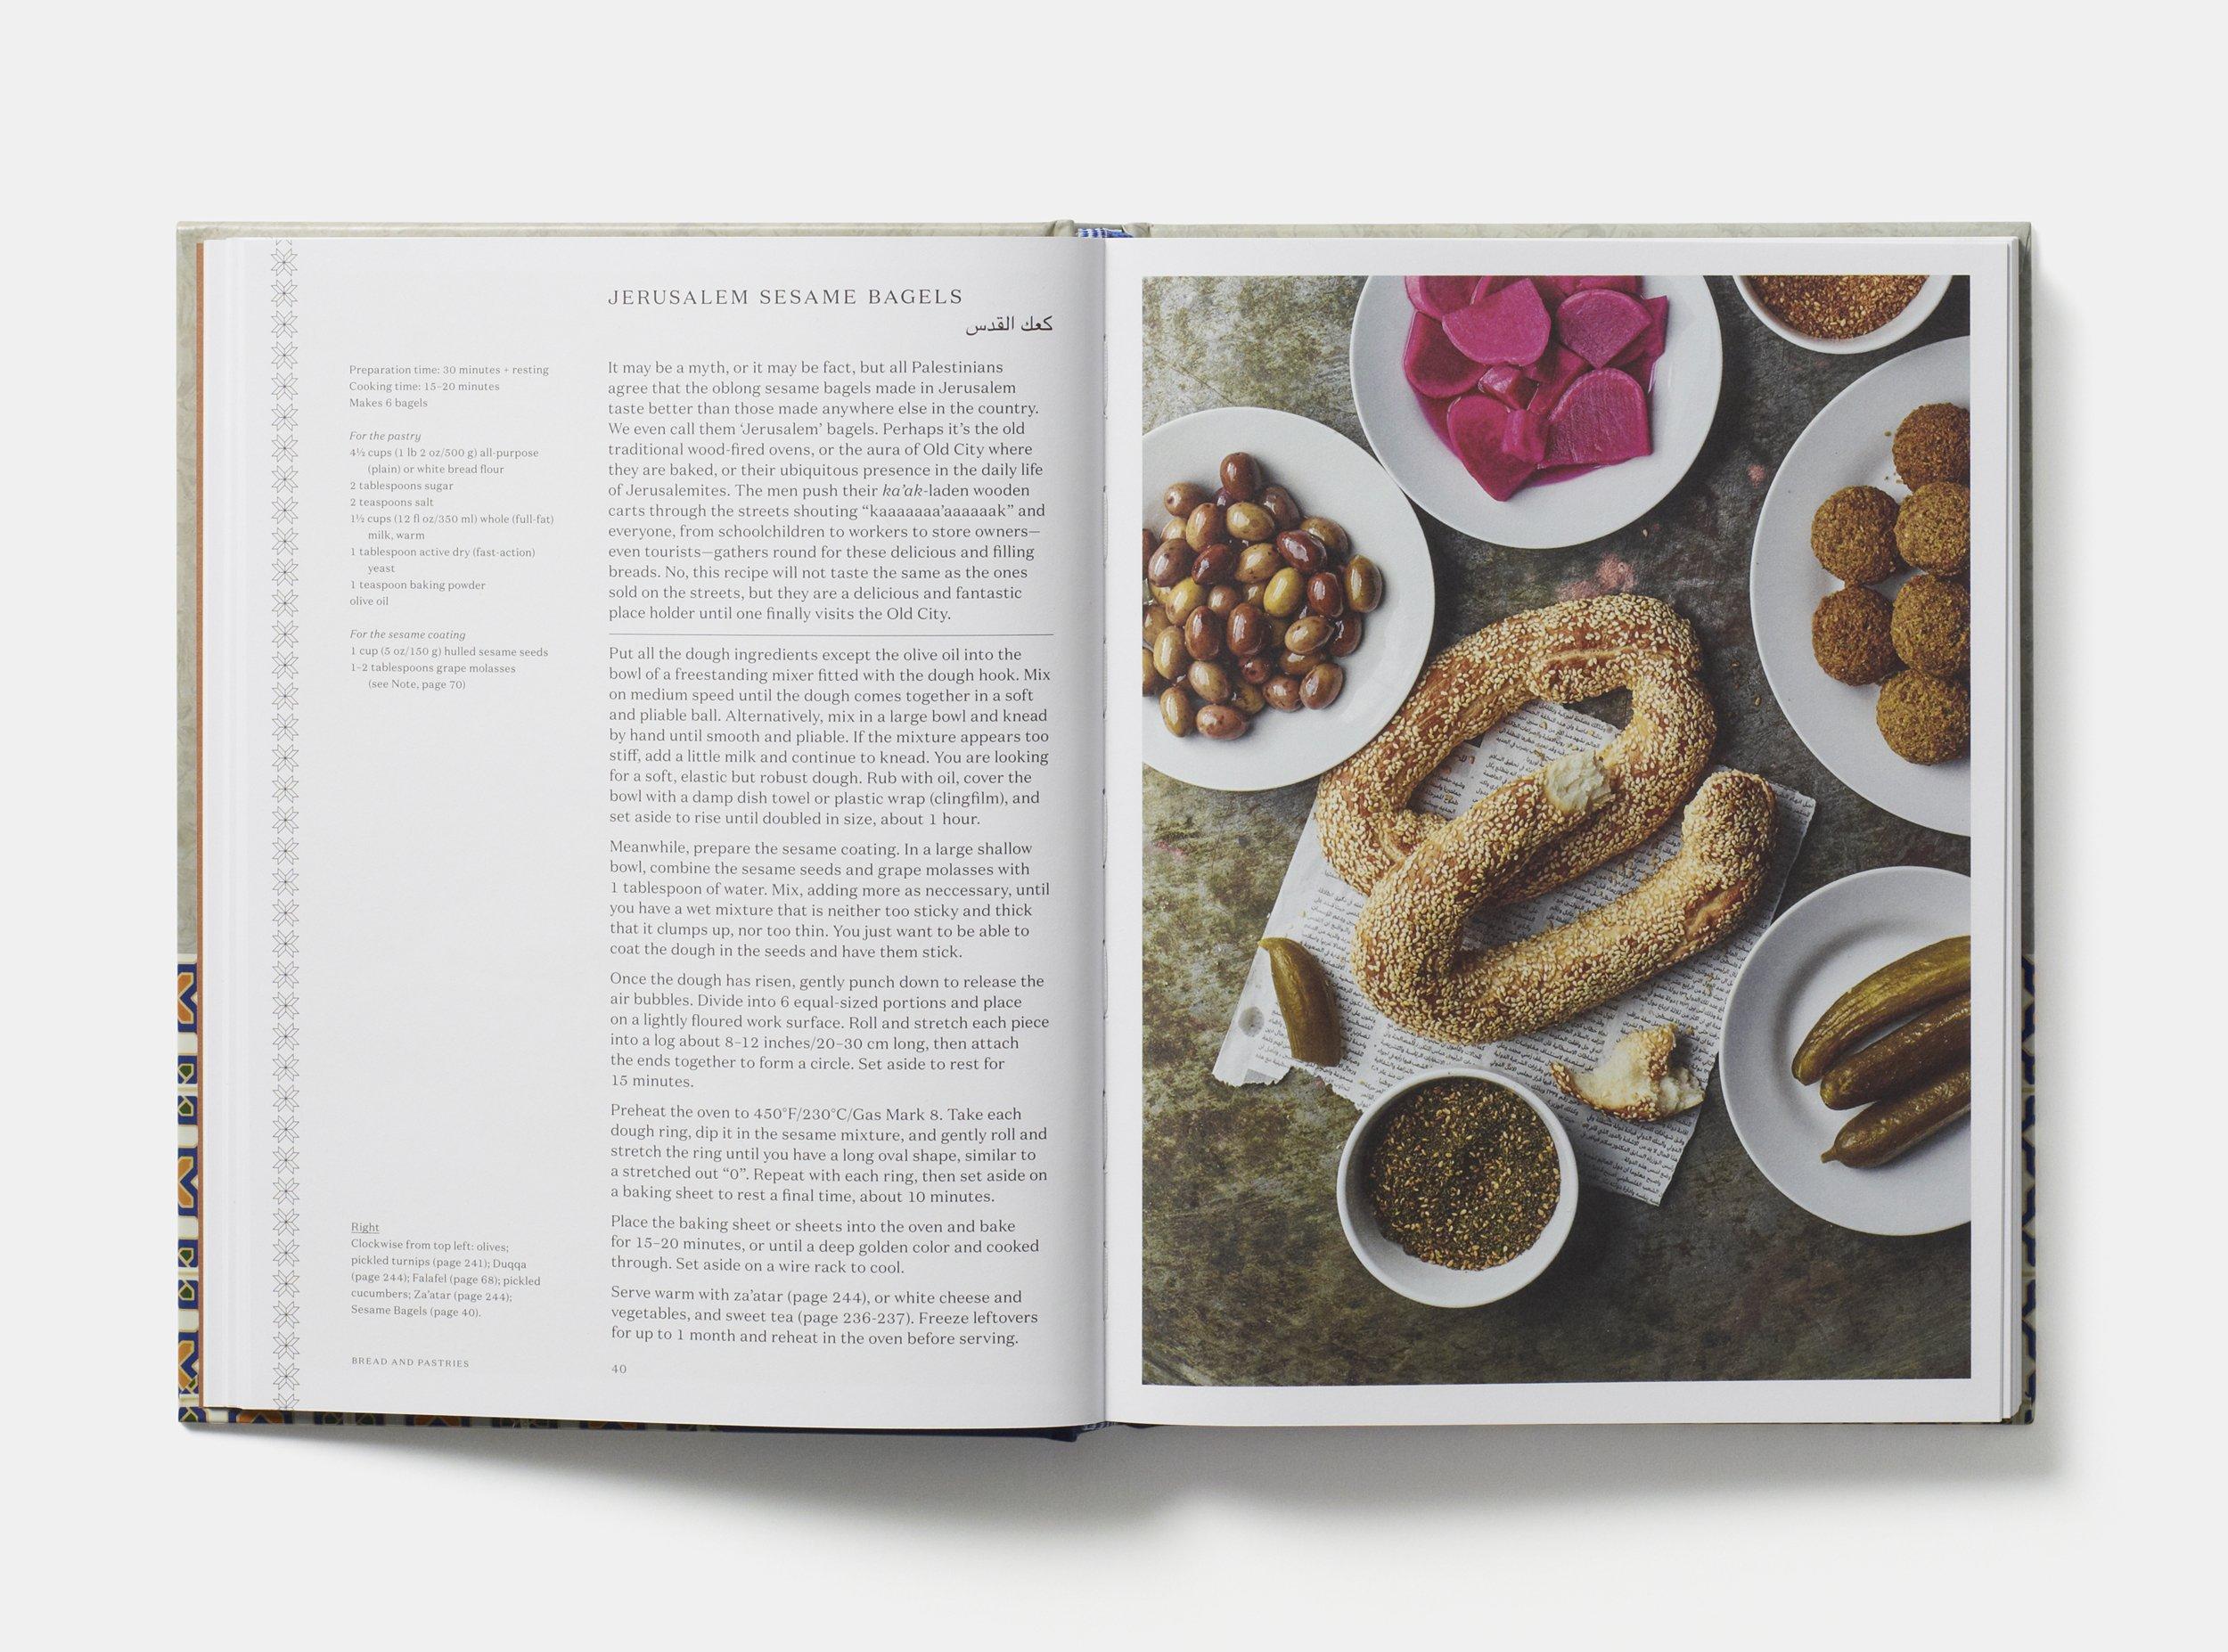 The Palestinian Table: Reem Kassis: 9780714874968: Amazon.com: Books